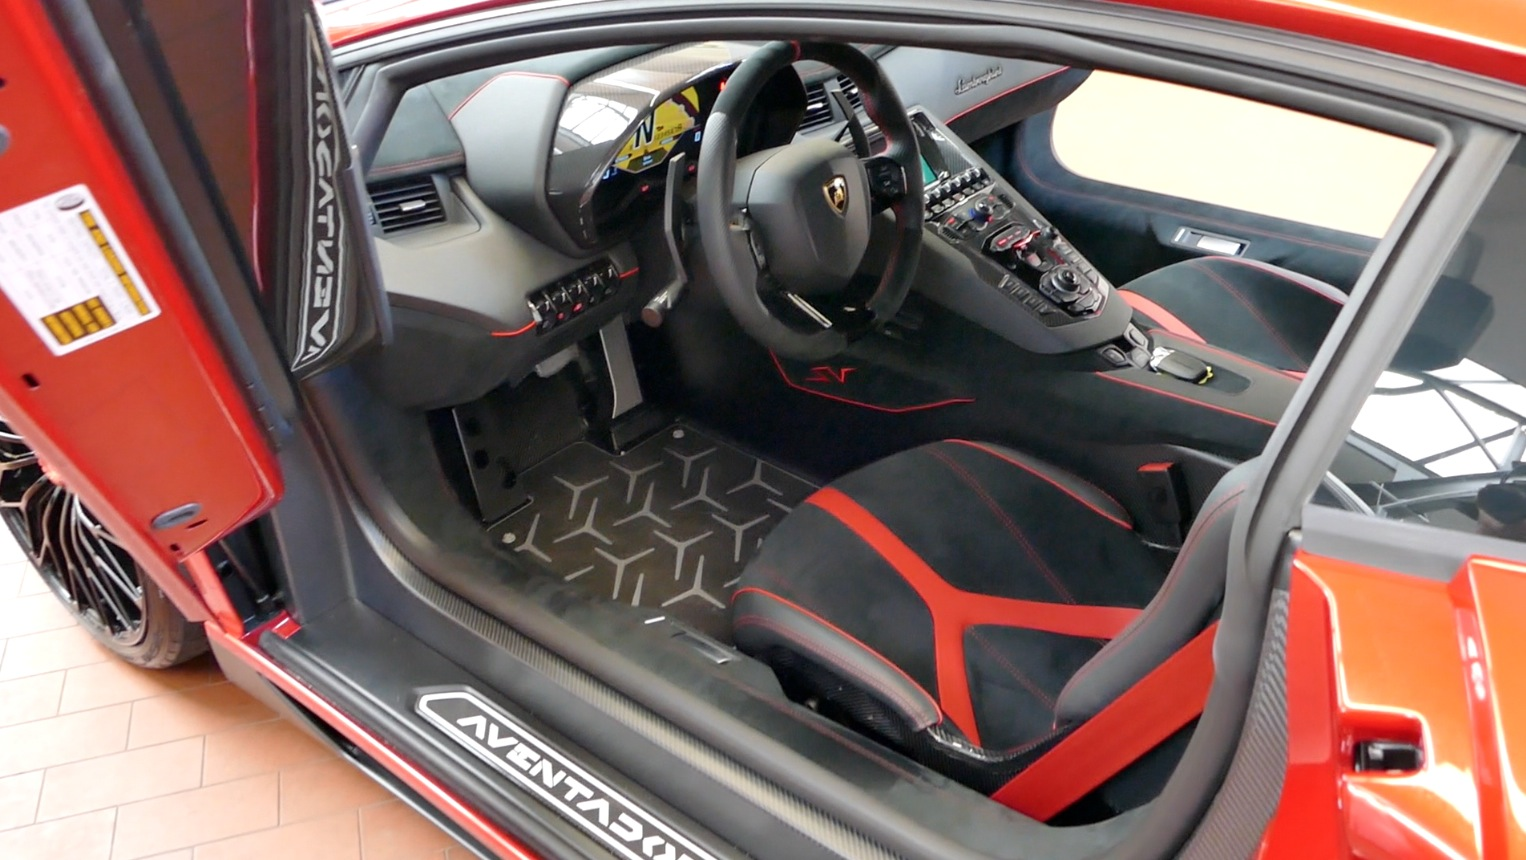 LamborghiniAventador-LP750-4_autogefueh008